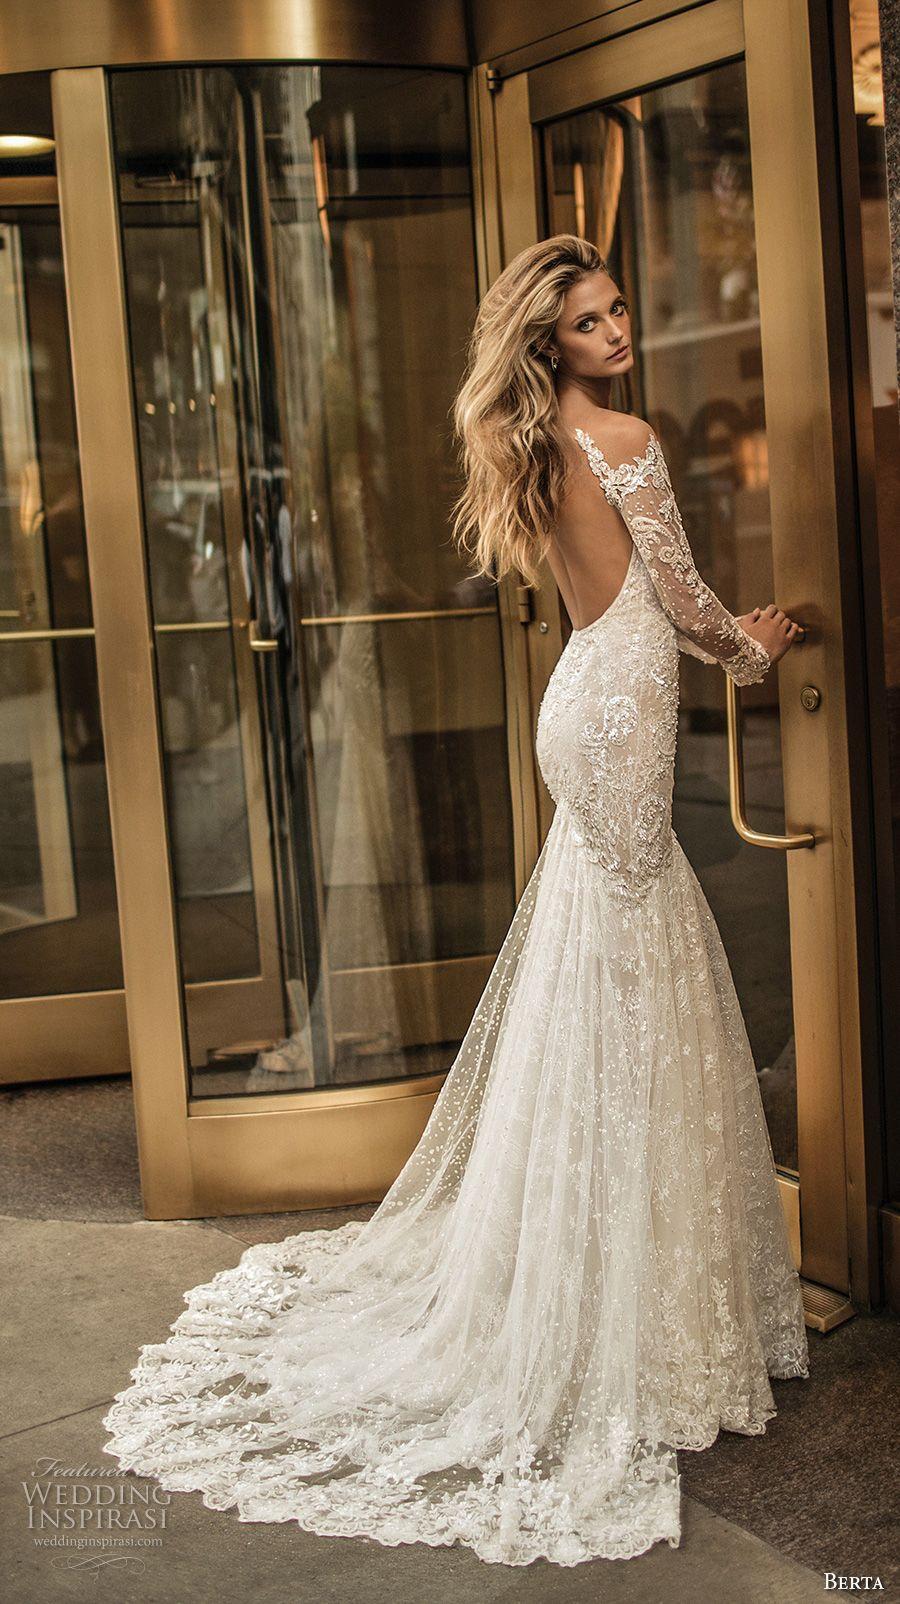 Berta Fall 2017 Wedding Dresses Wedding Inspirasi Wedding Dresses Lace Wedding Dress Low Back Wedding Dresses Romantic [ 1604 x 900 Pixel ]